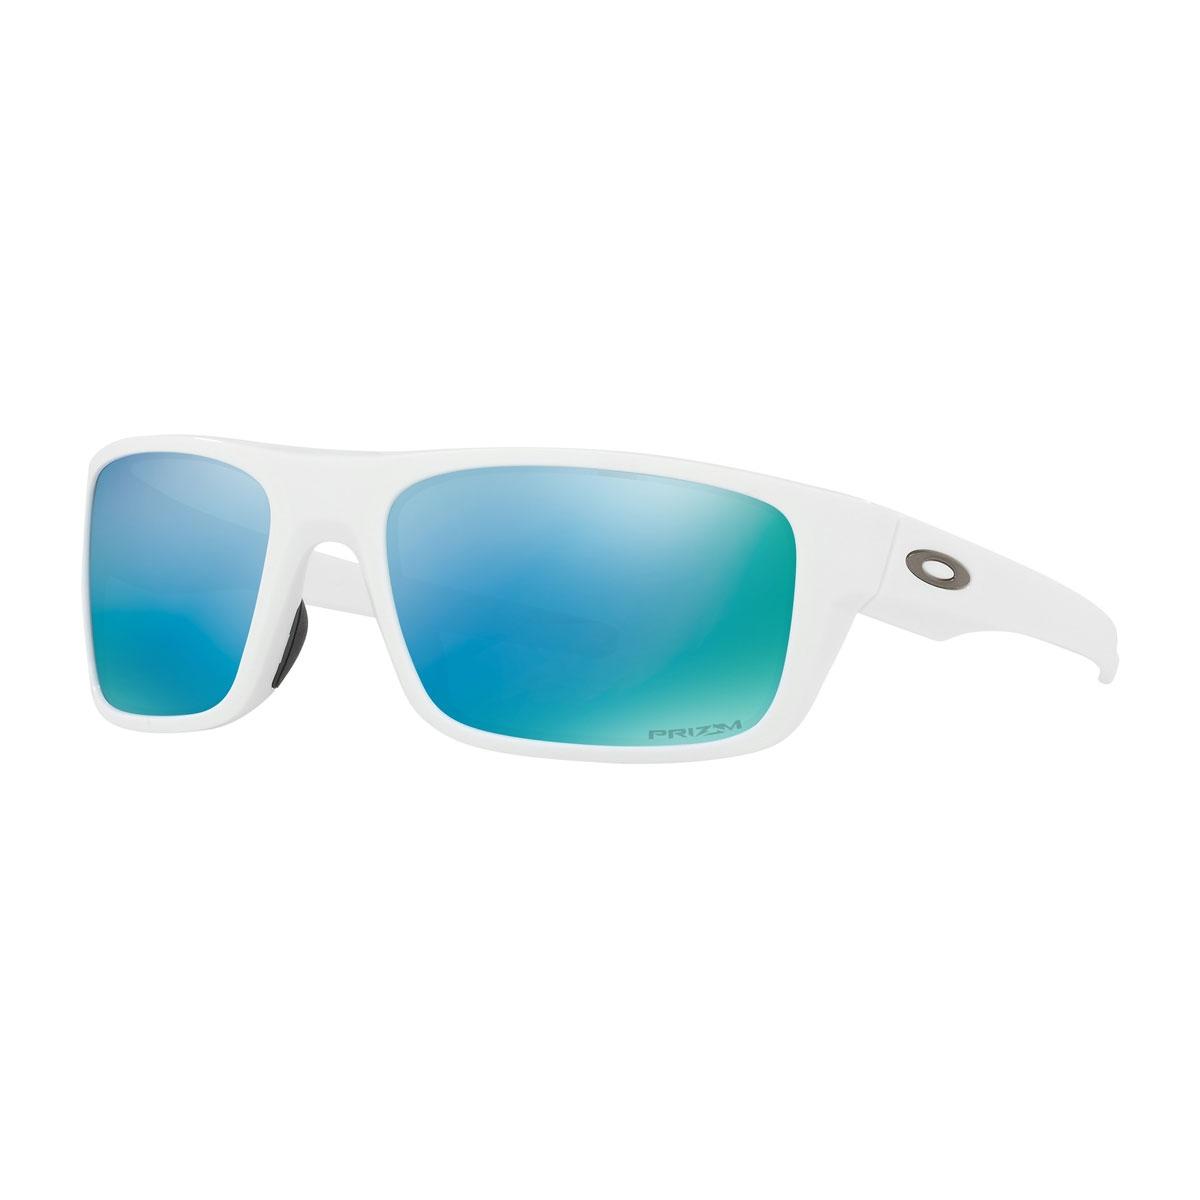 479fb85c05eb Image of Oakley Drop Point Prizm Polarised Sunglasses - Polished White  Frame PRIZM Deep Water